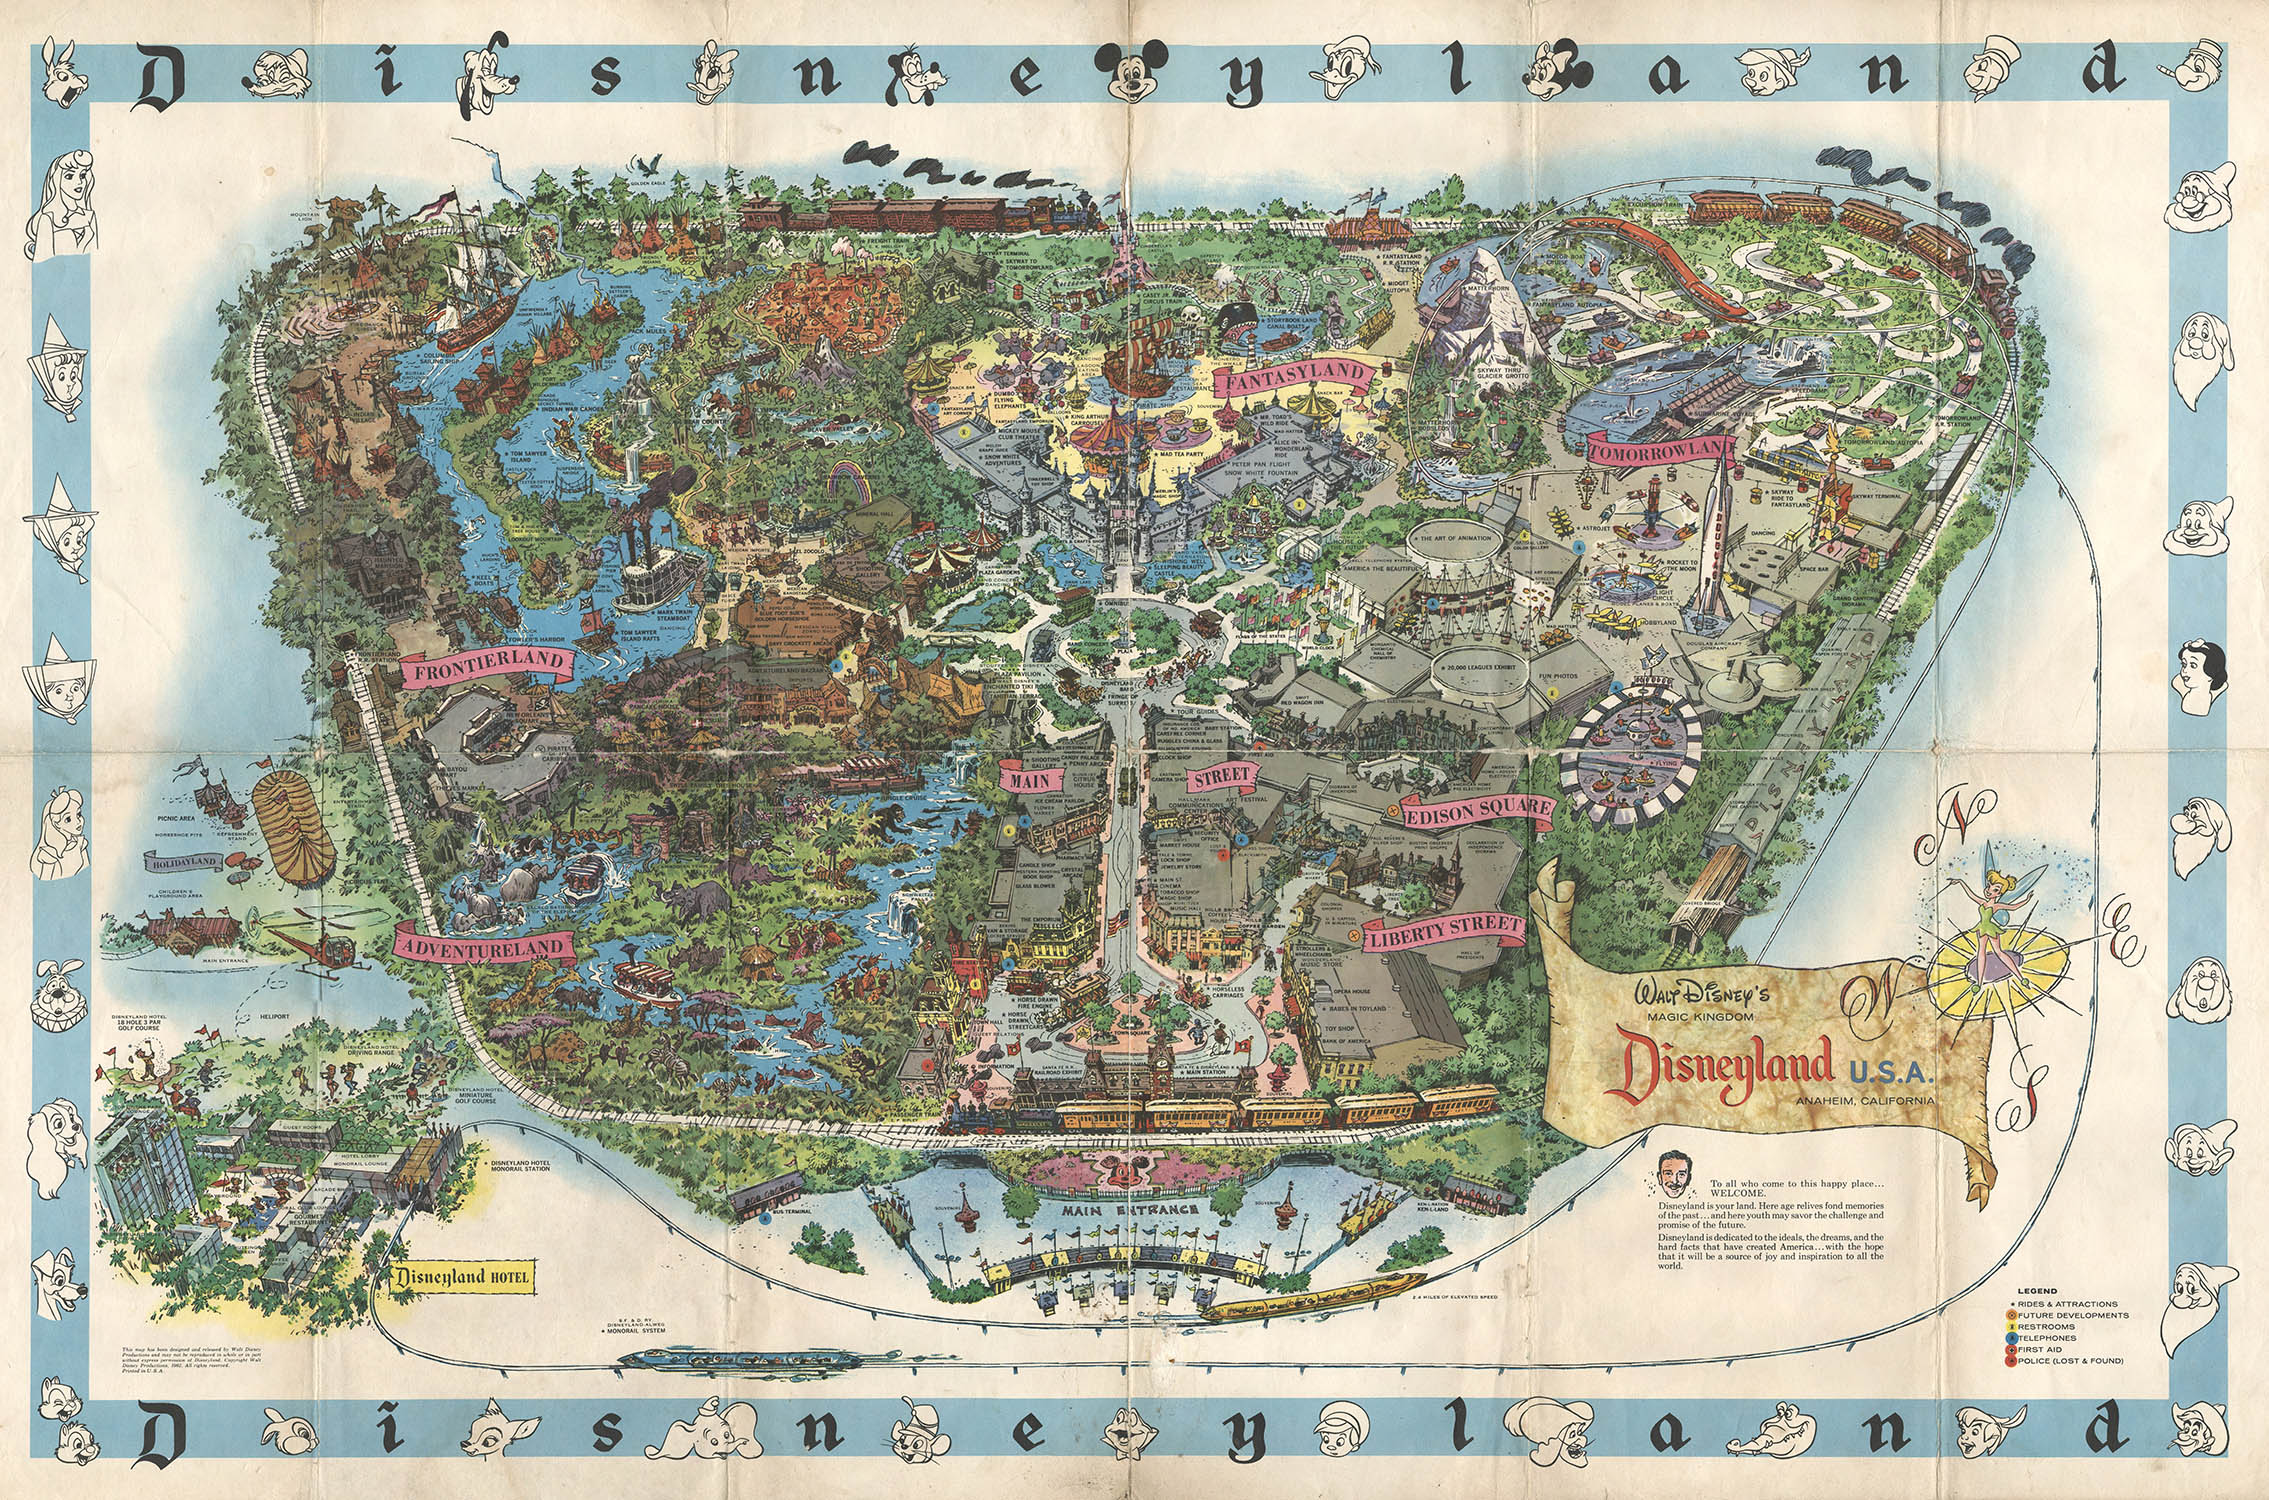 kart over disneyland